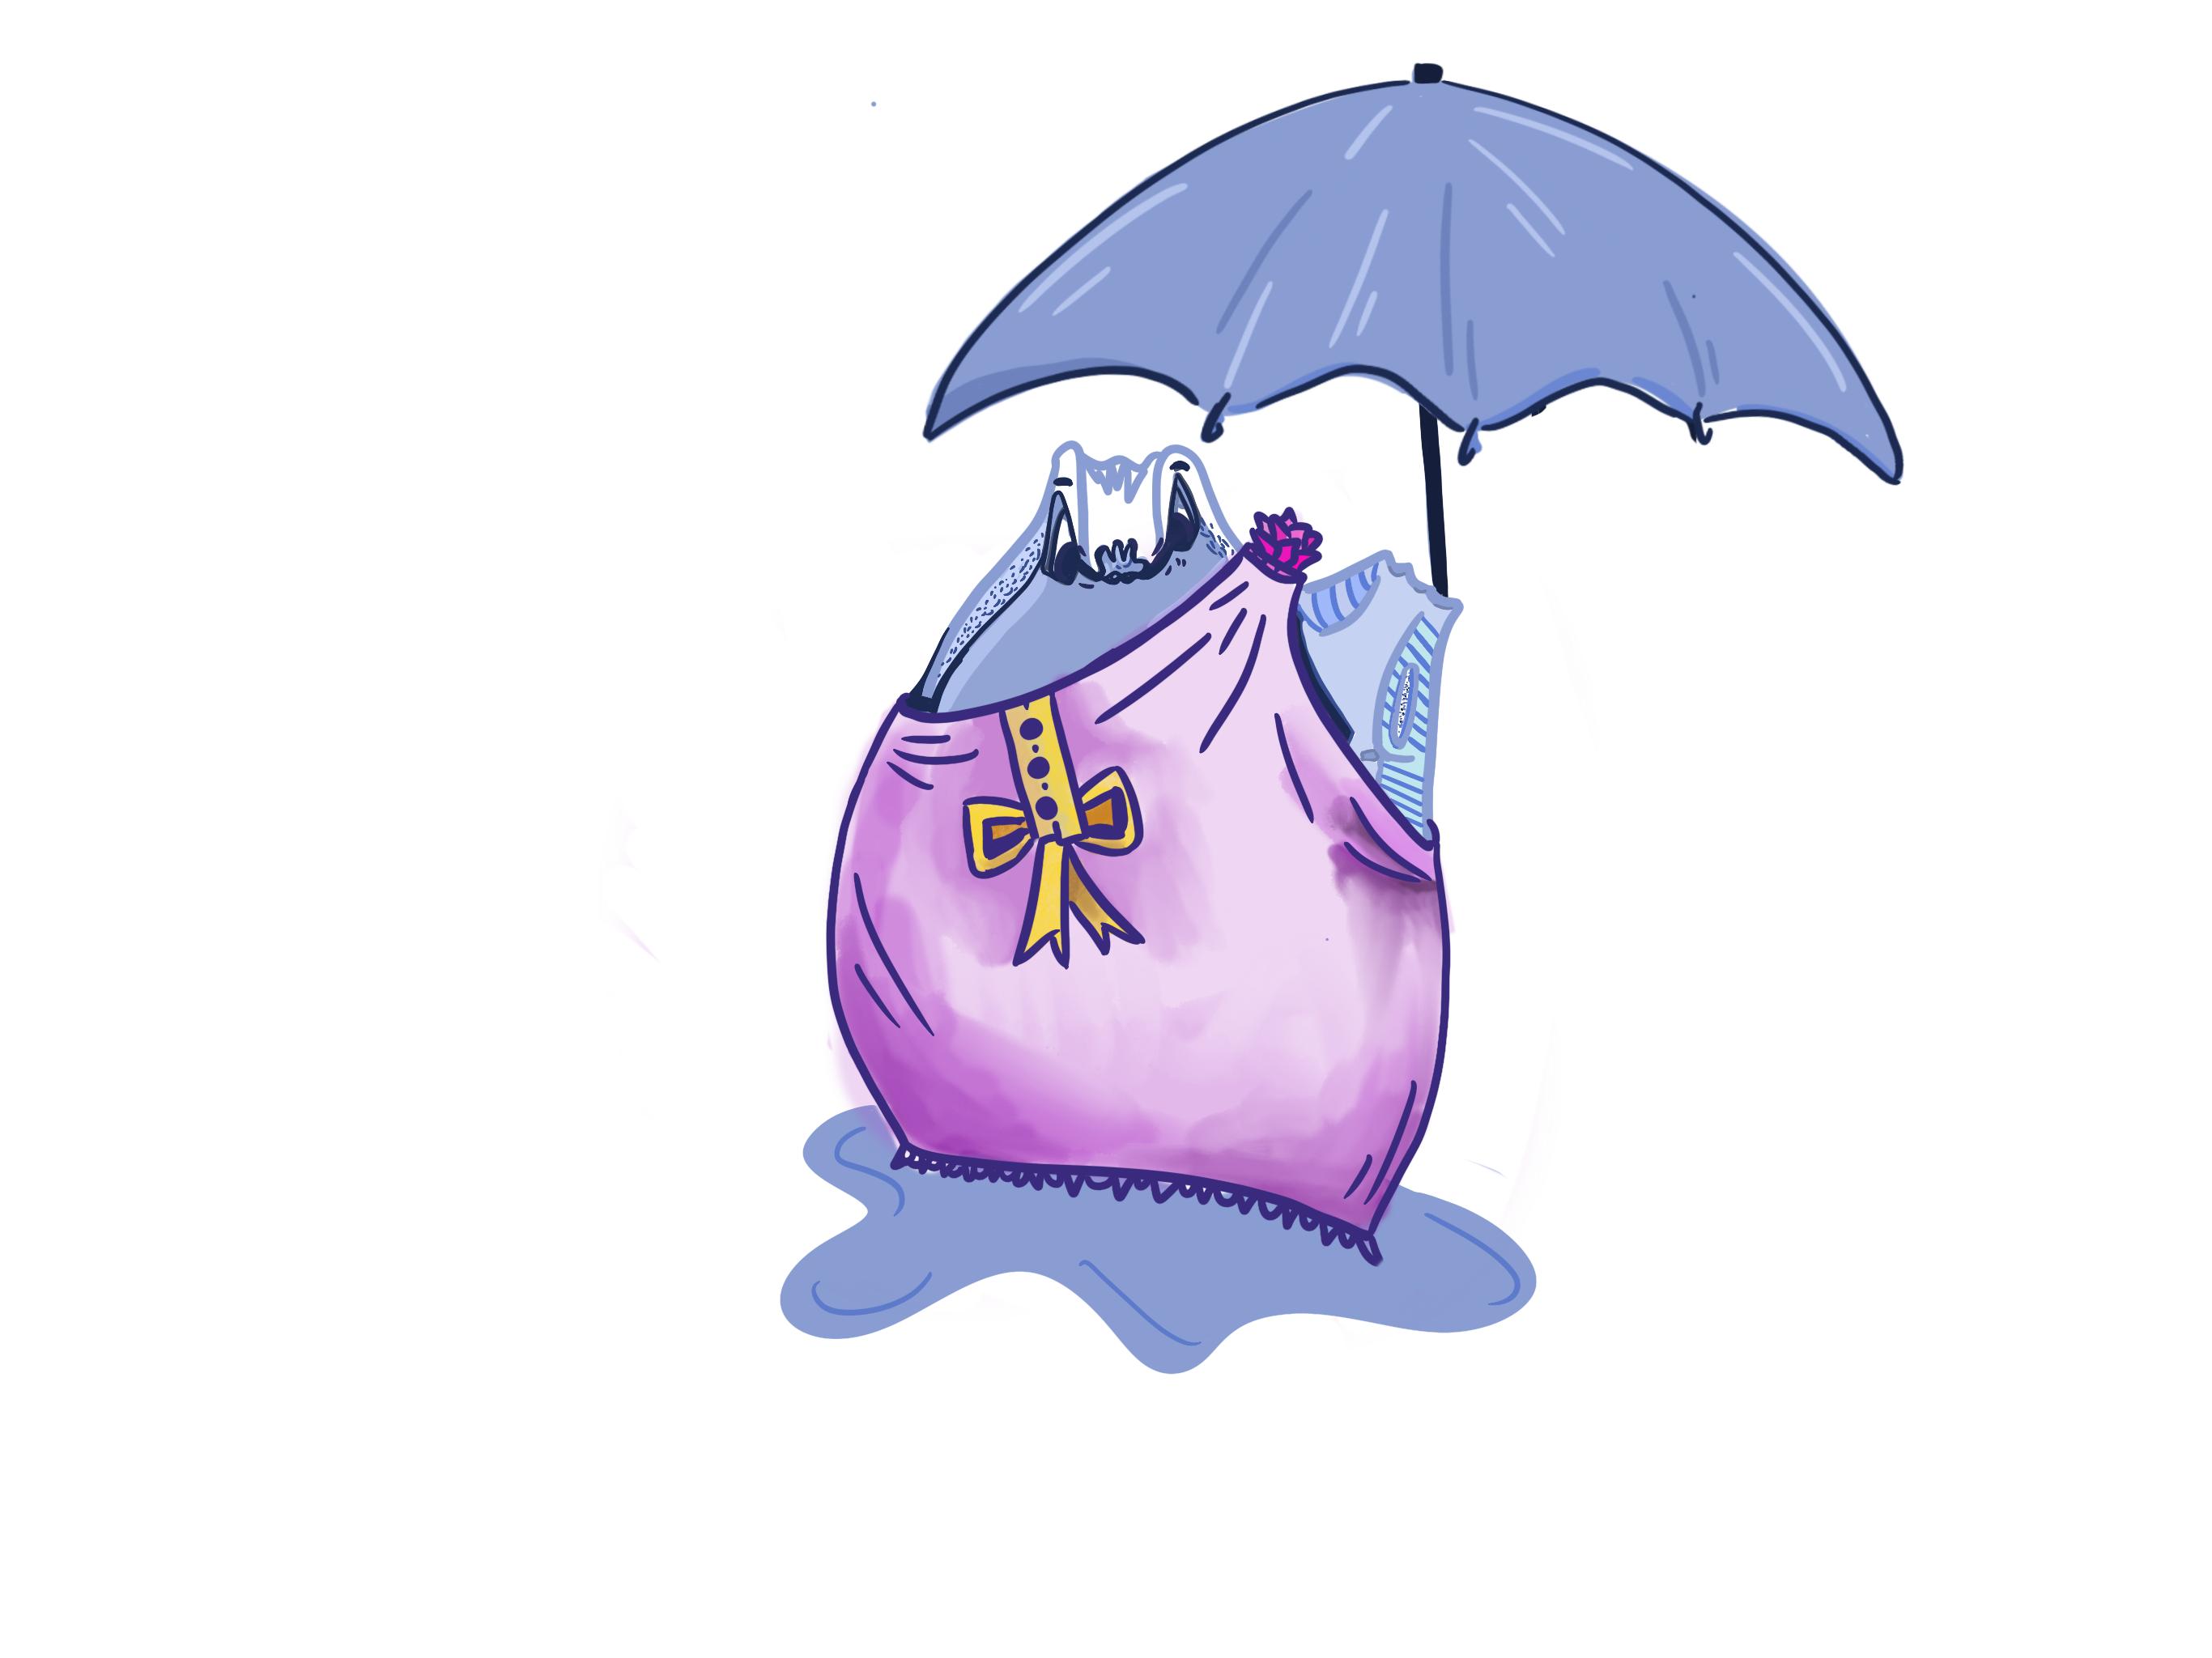 https://cloud-7jhgcpjfb-hack-club-bot.vercel.app/0untitled_artwork_6.png